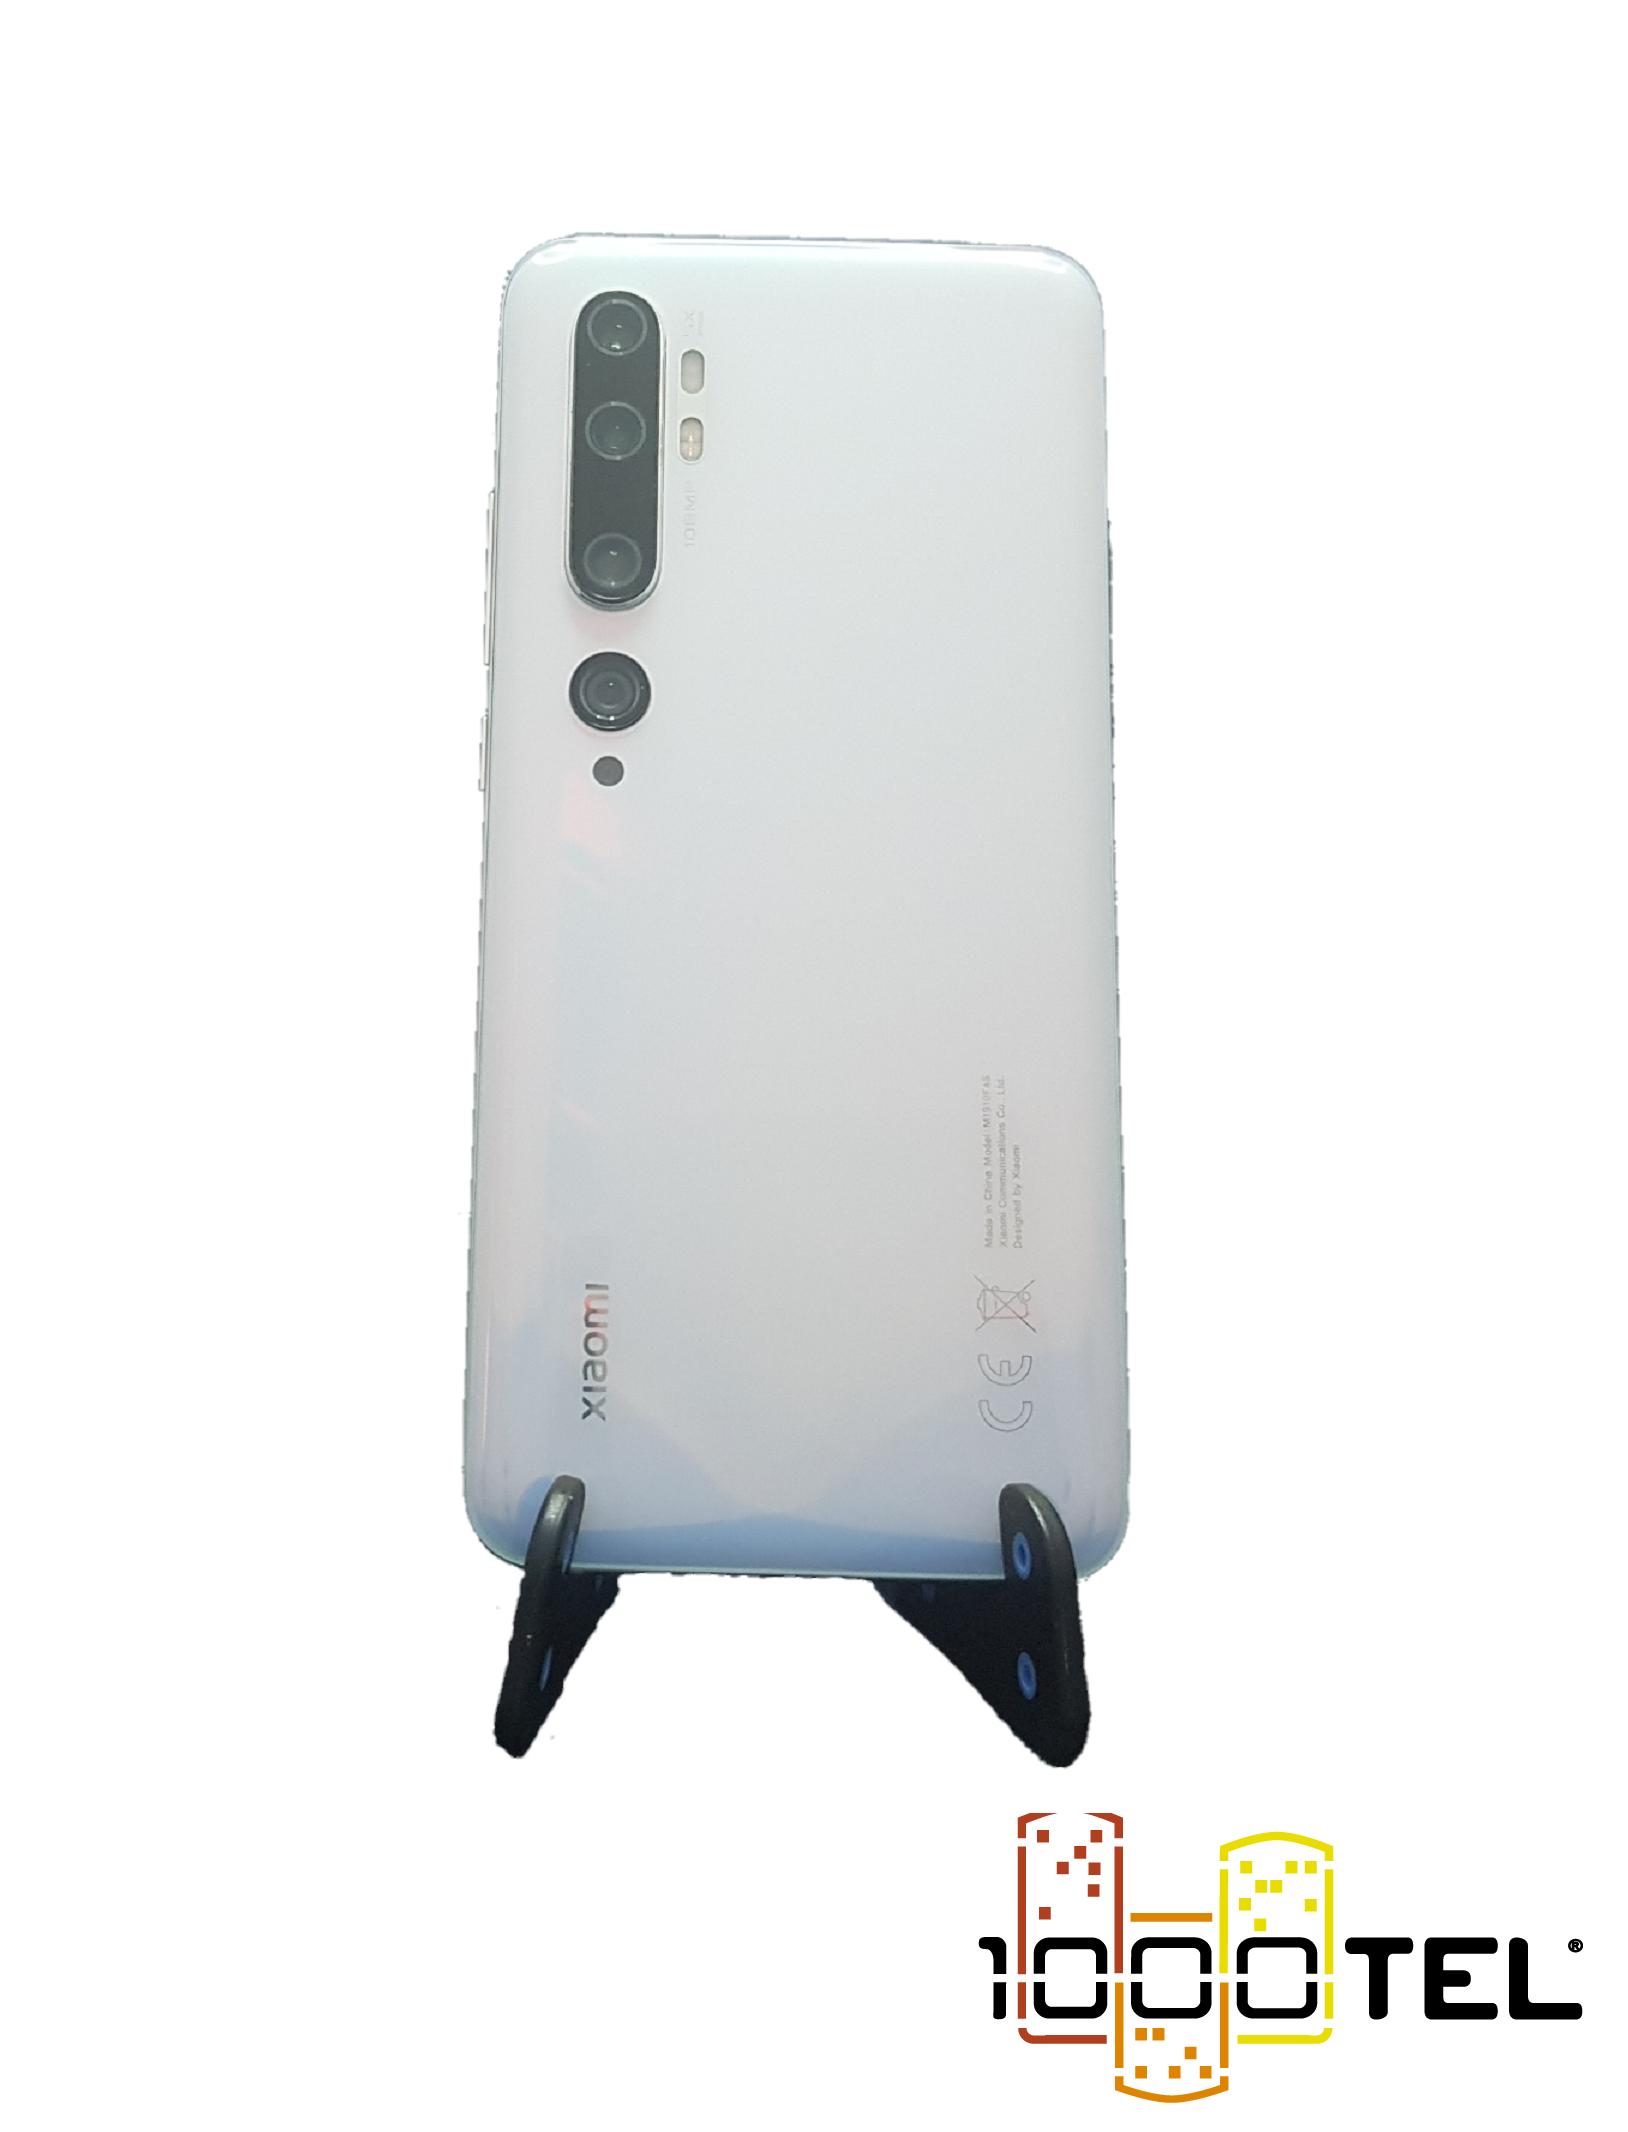 Xiaomi Mi Note 10 Pro #2